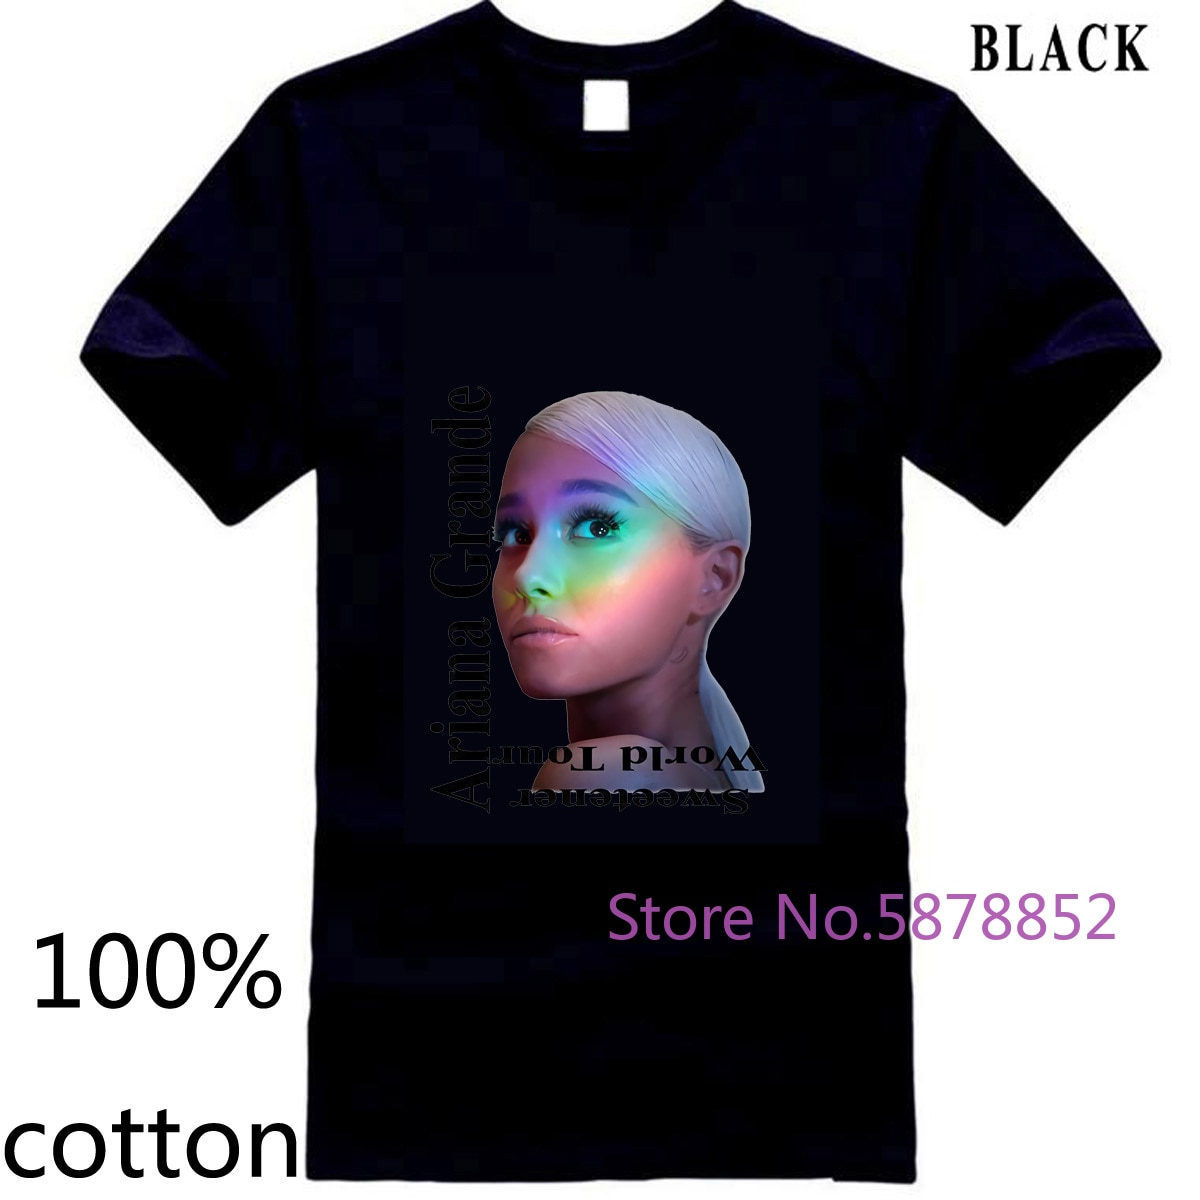 Vintage Ariana Grande - Sweetener World Tour Best Reprint New Men Classical men's t shirt t-shirt tops tees 100% cotton